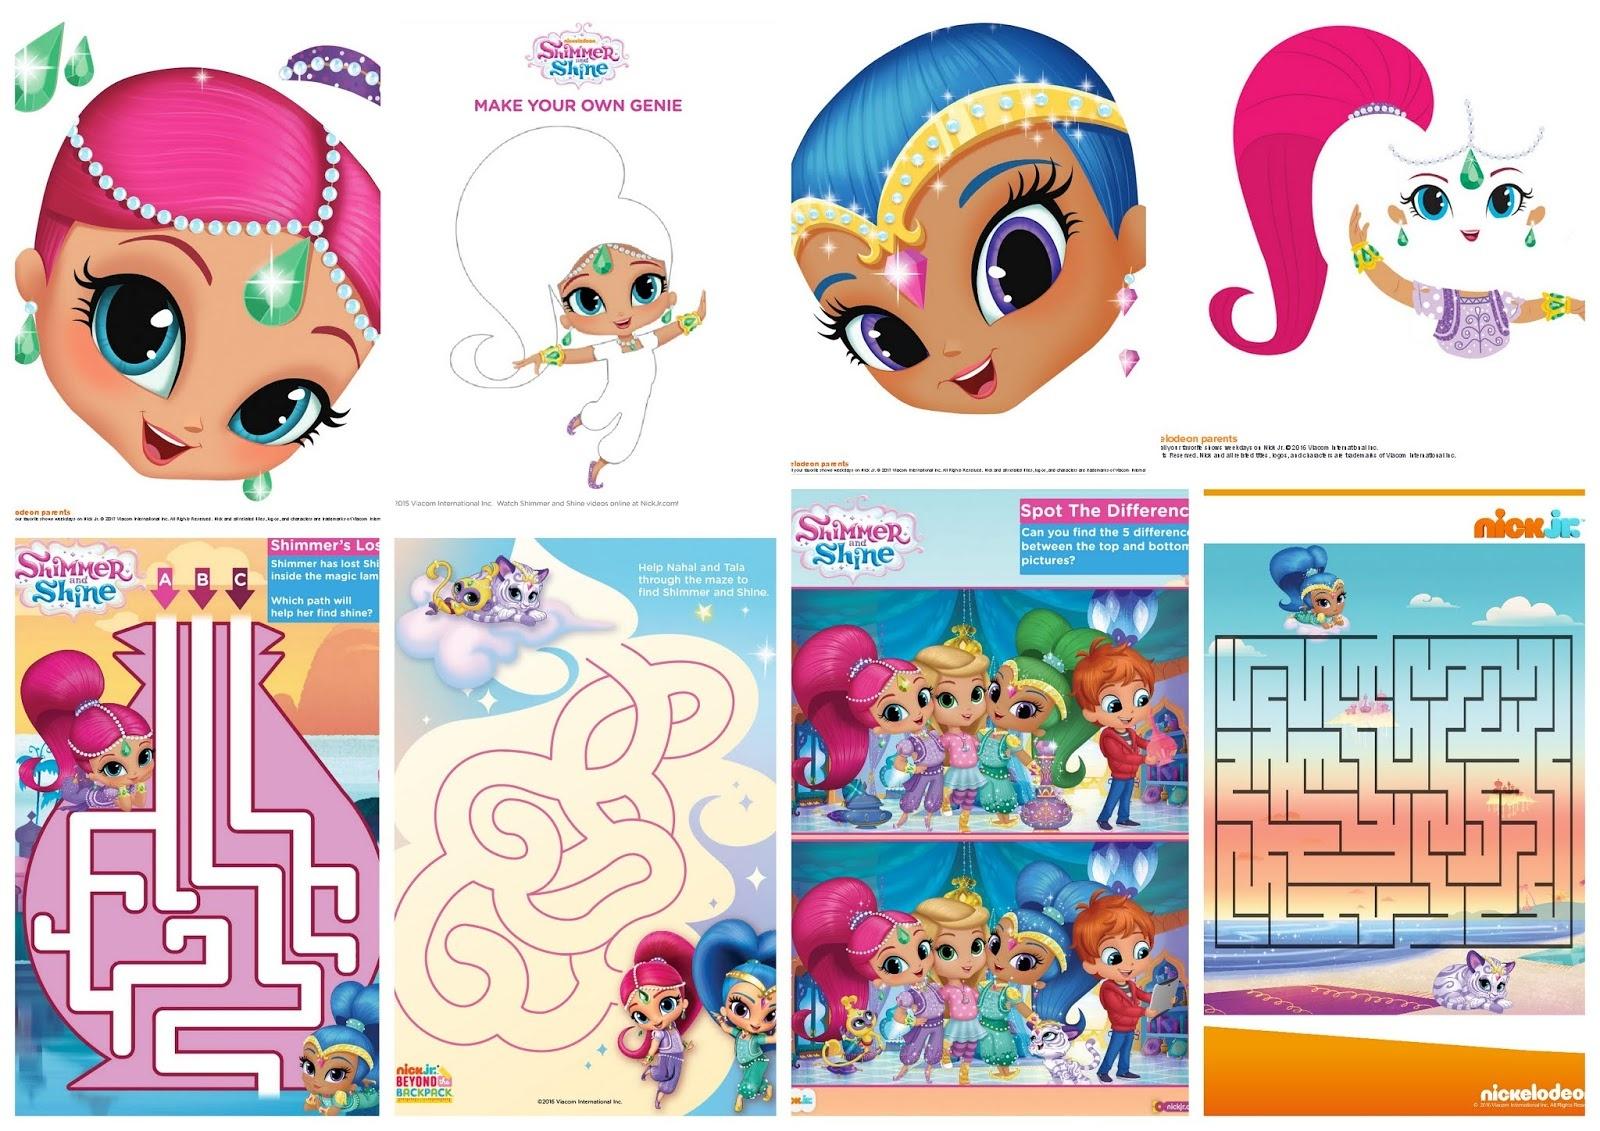 Shimmer And Shine Free Printable Nickelodeon Activity Book. - Oh My - Shimmer And Shine Free Printables